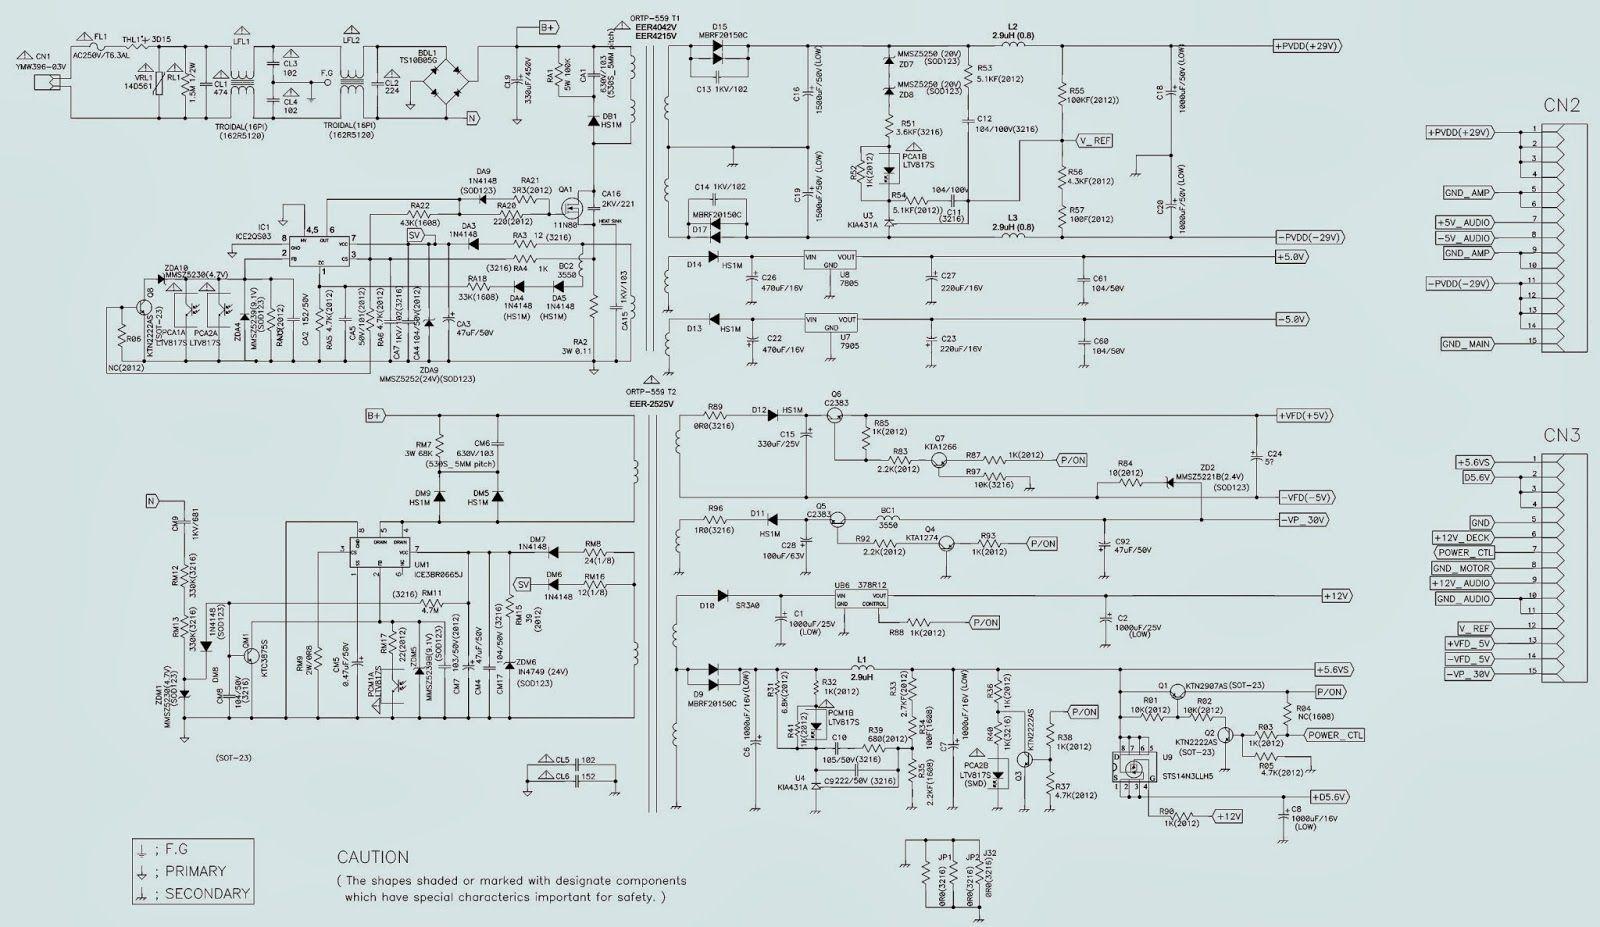 Schematic Diagram For Samsung Mx C730 Mx C630 Power Amp 1 Power Amp Samsung Power